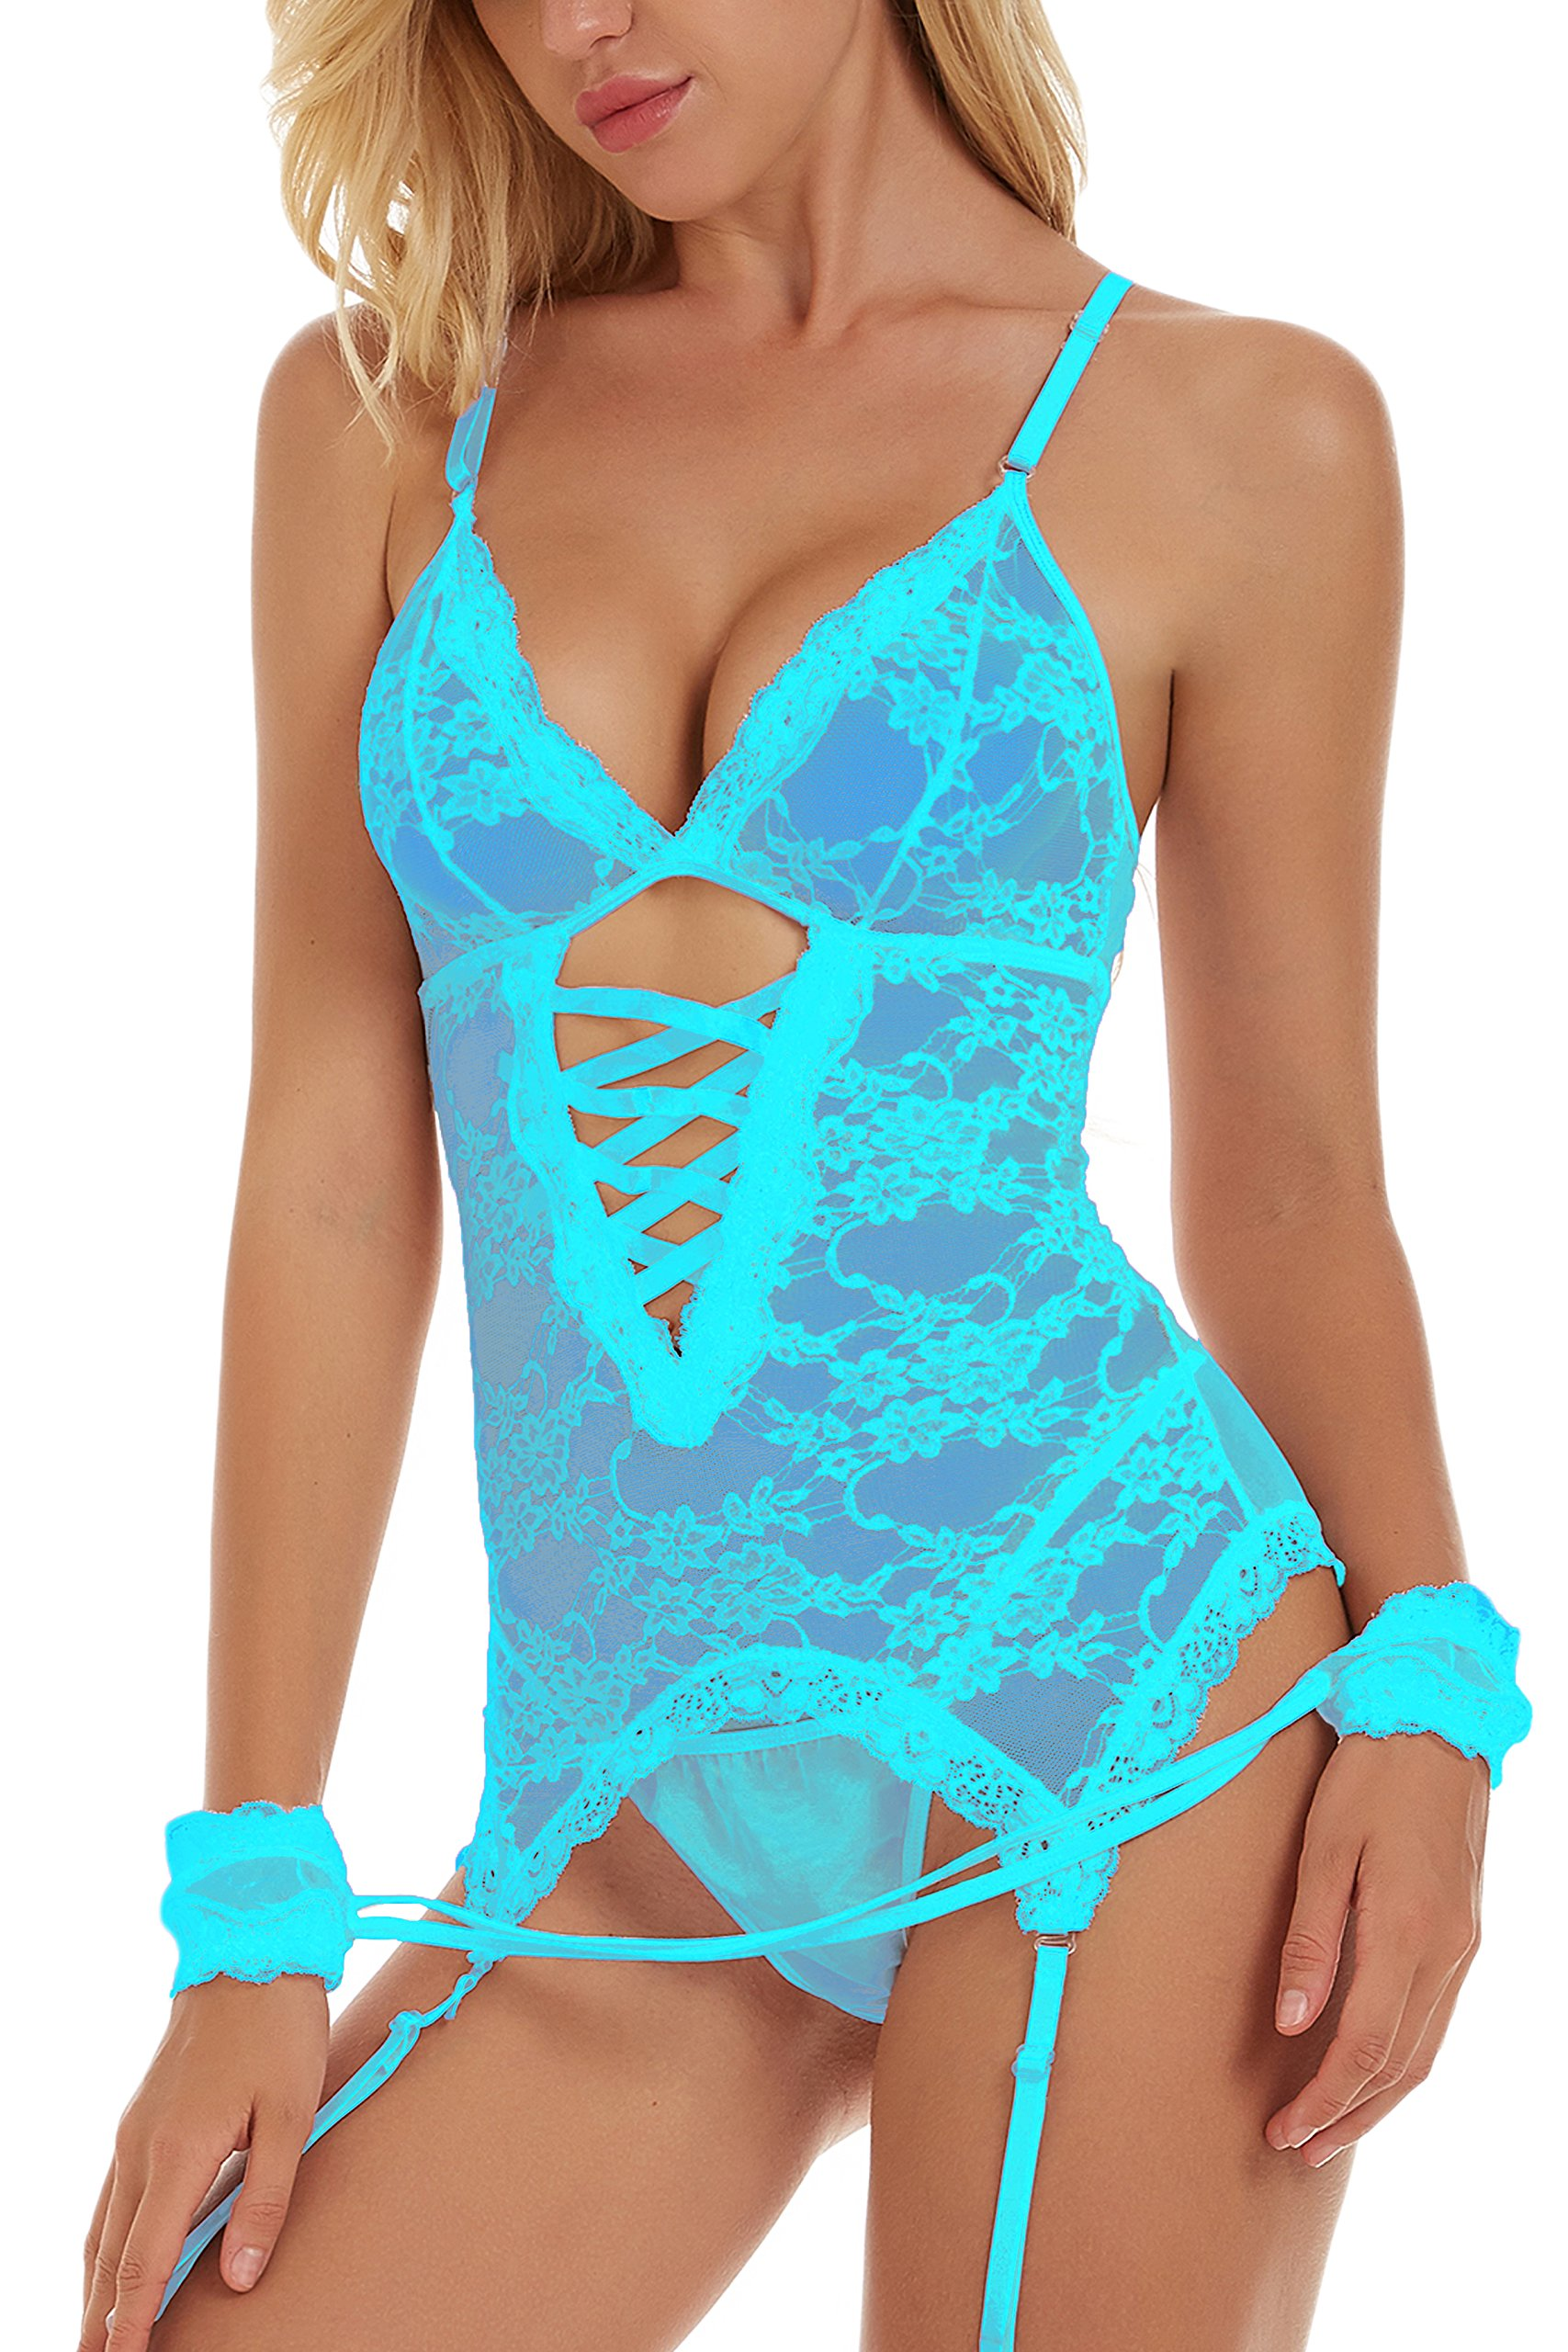 c75c0f2abffec Unilove Bodysuit Lingerie for Women Sexy Corset with Straps Lace Babydoll  Chemise (M, Blue